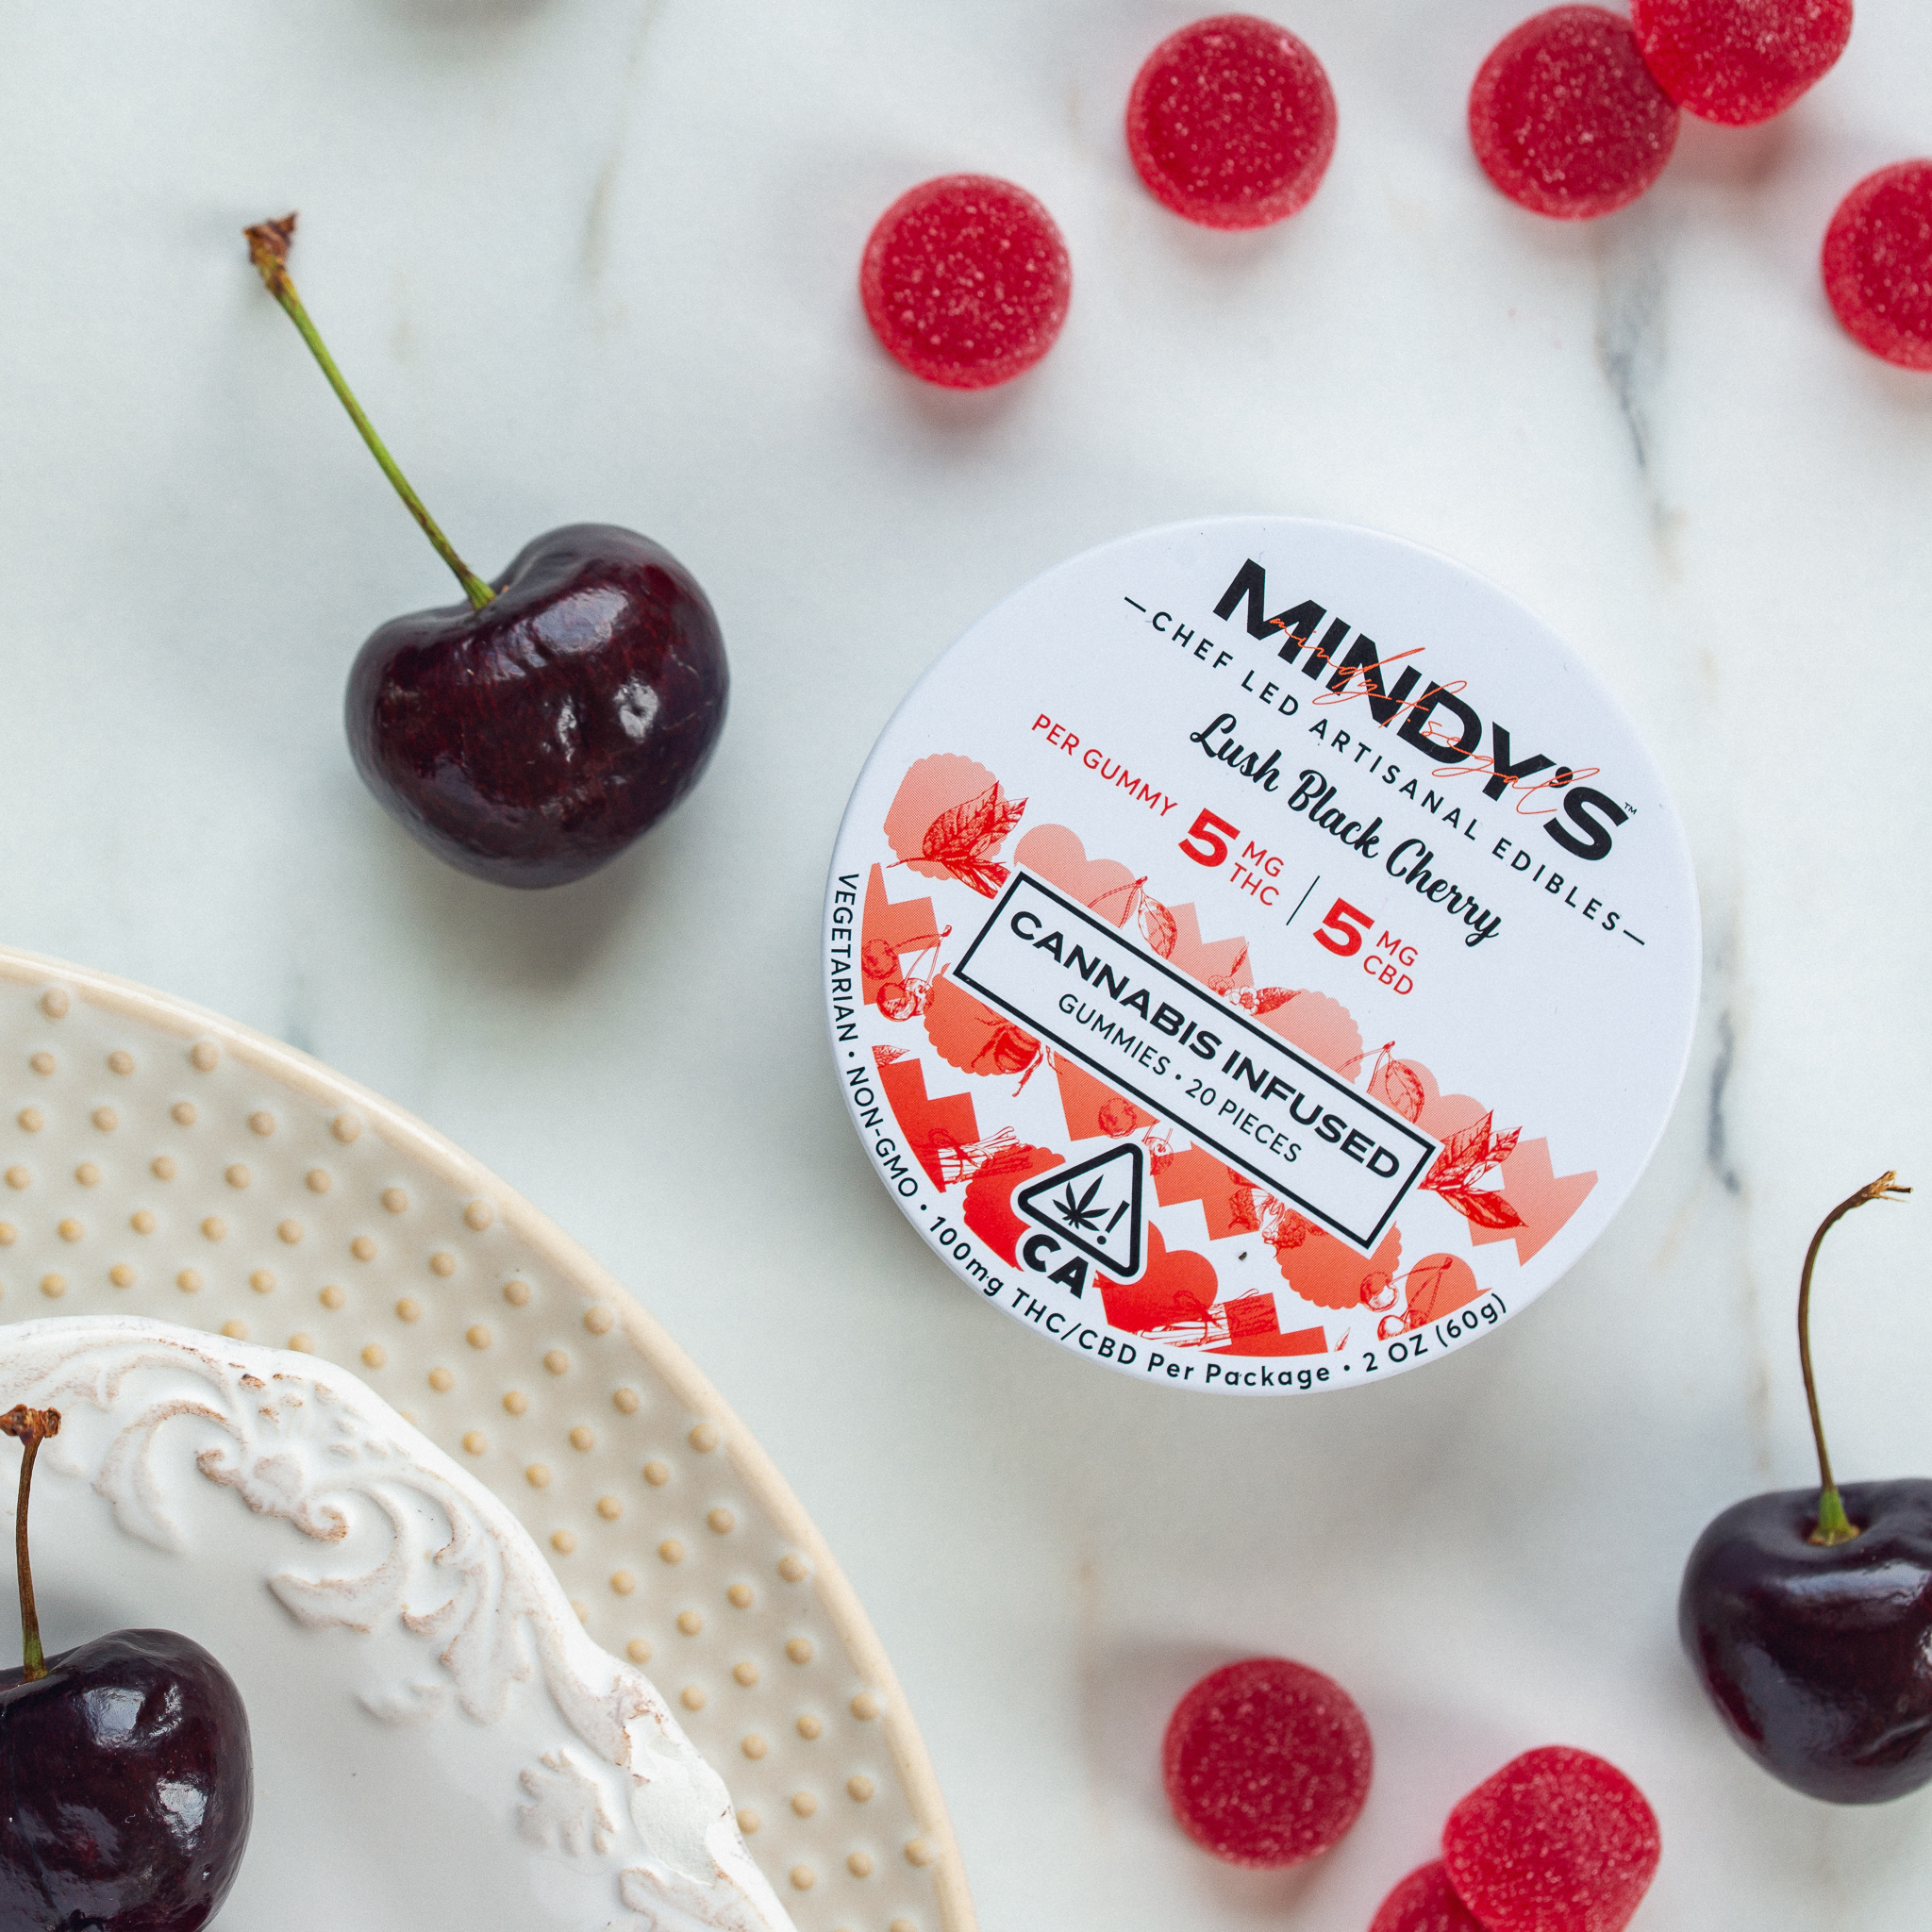 Mindys Lush black Cherry Package